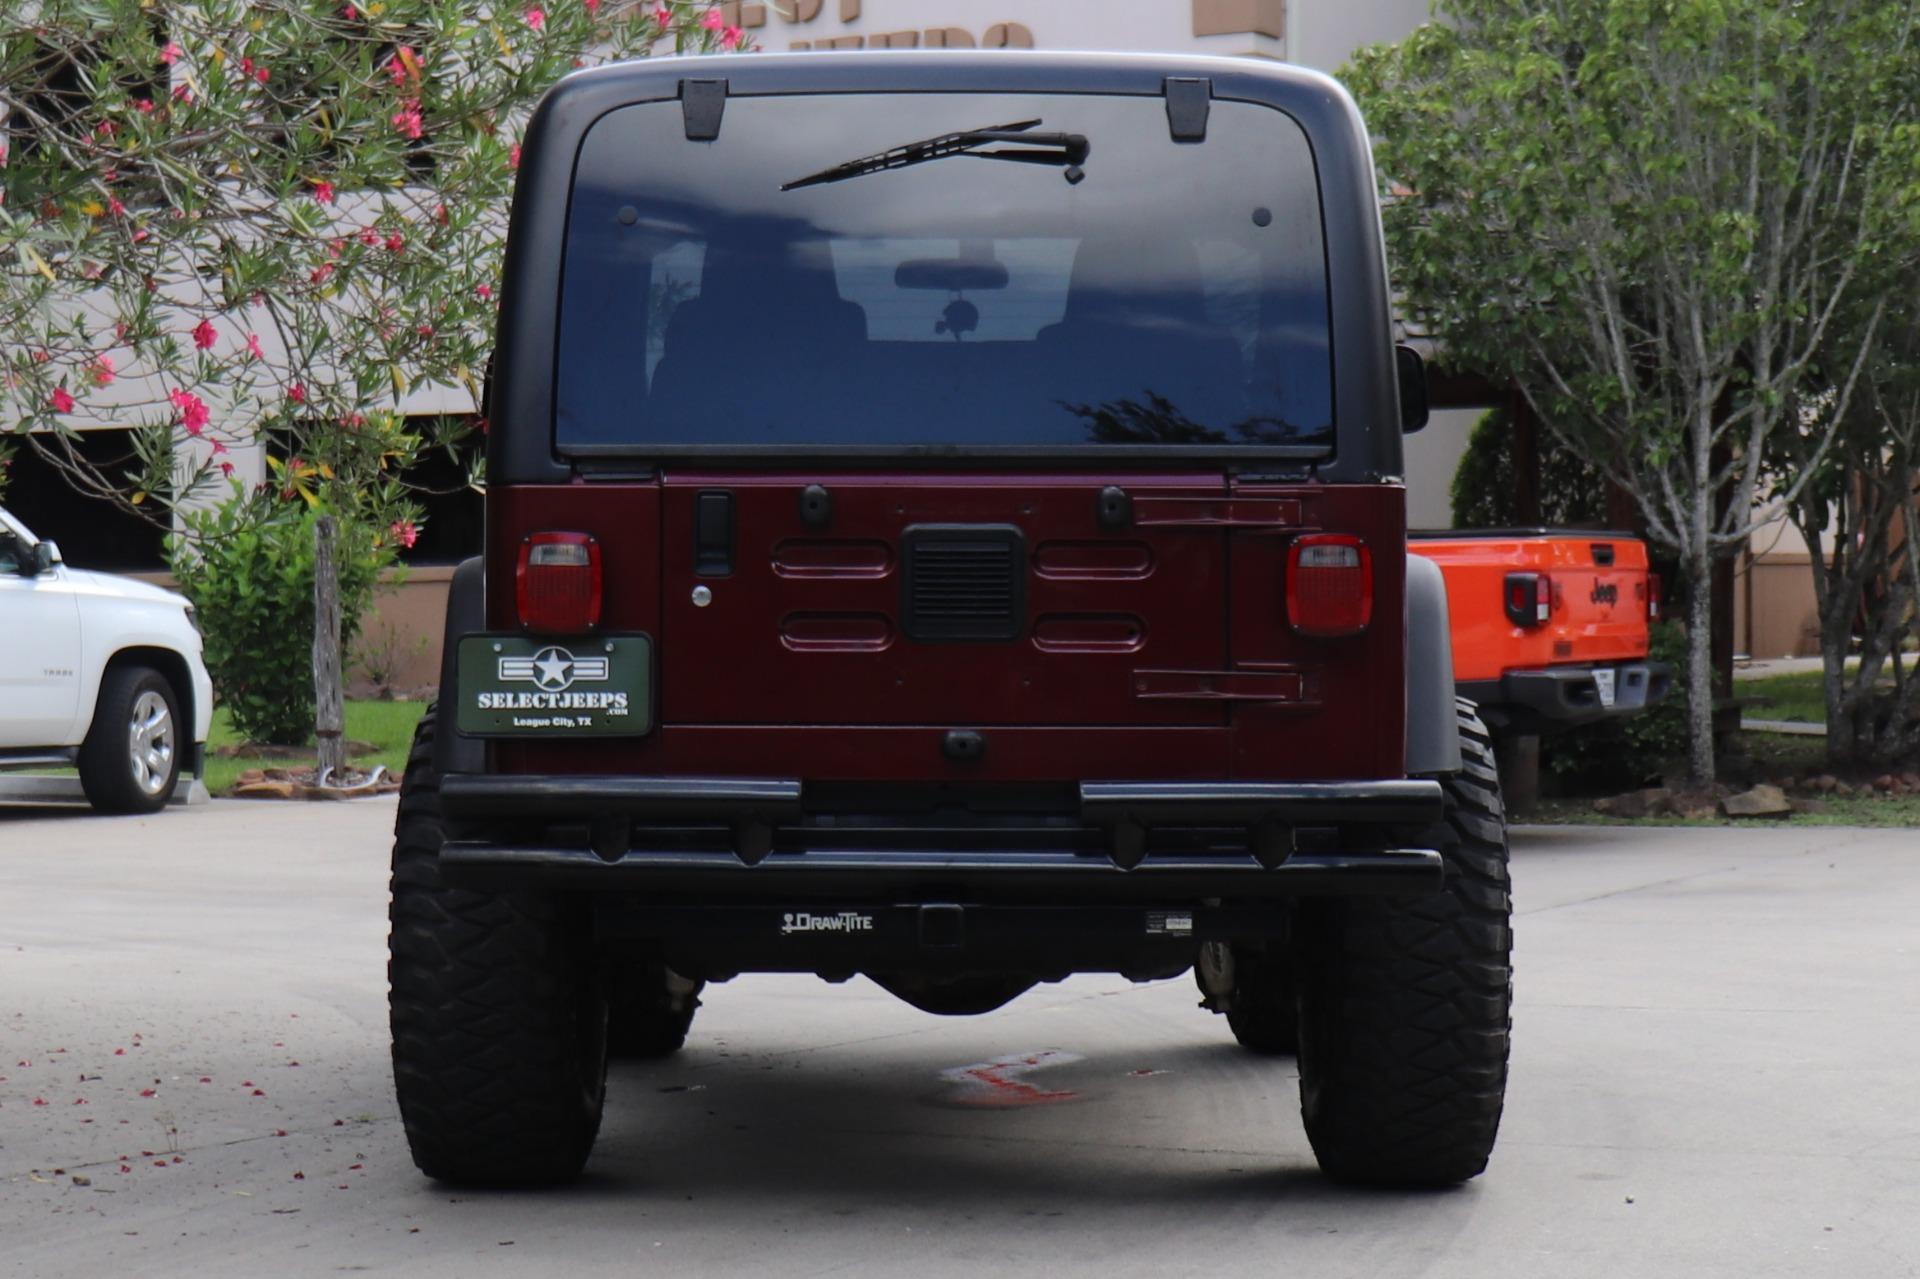 Used-2004-Jeep-Wrangler-X